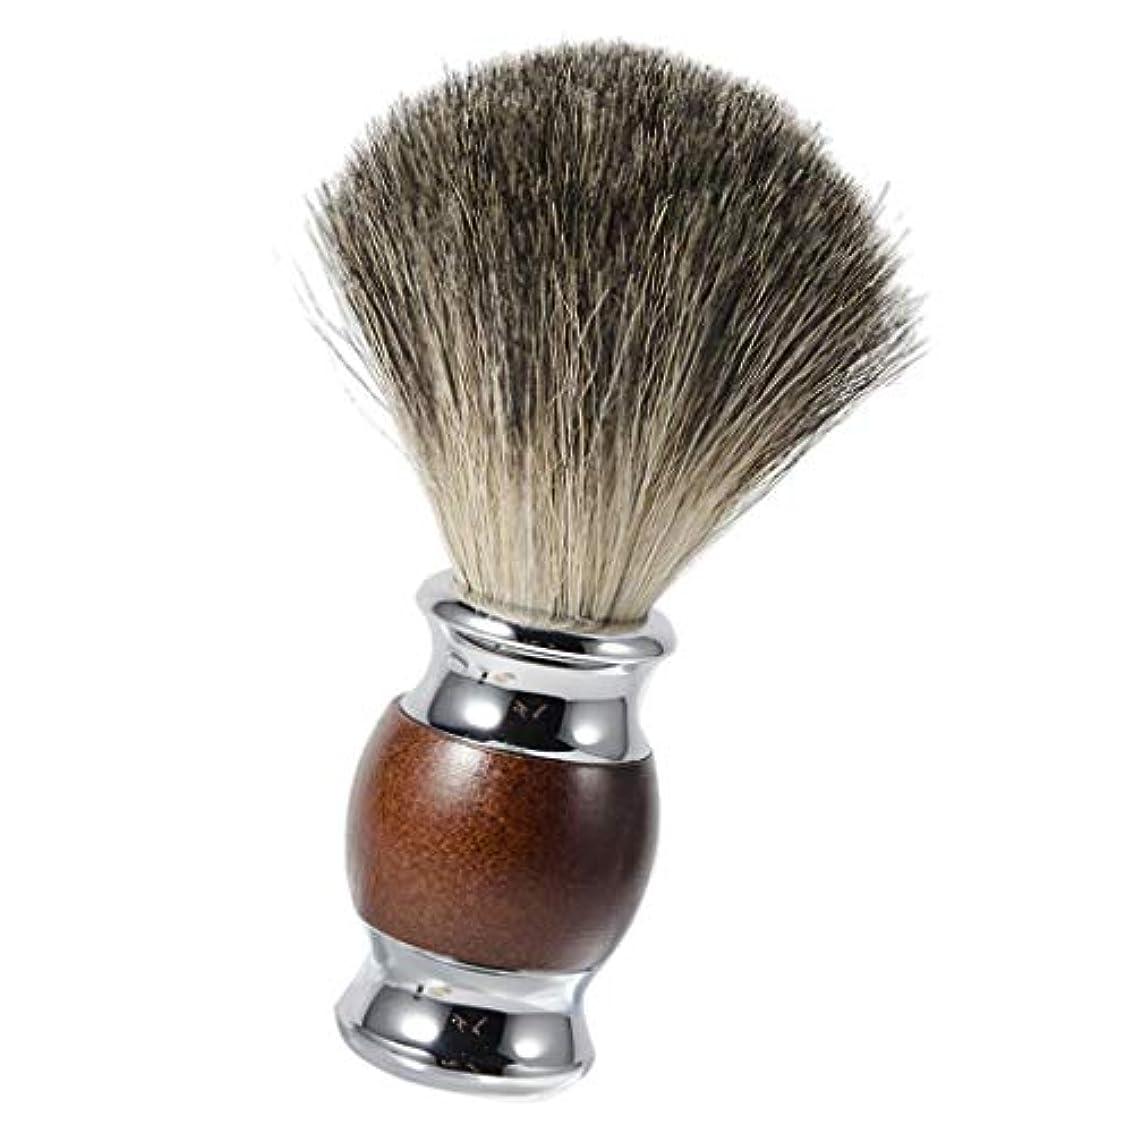 chiwanji シェービング用ブラシ シェービングブラシ メンズ 理容 洗顔 髭剃り シェービング用アクセサリー